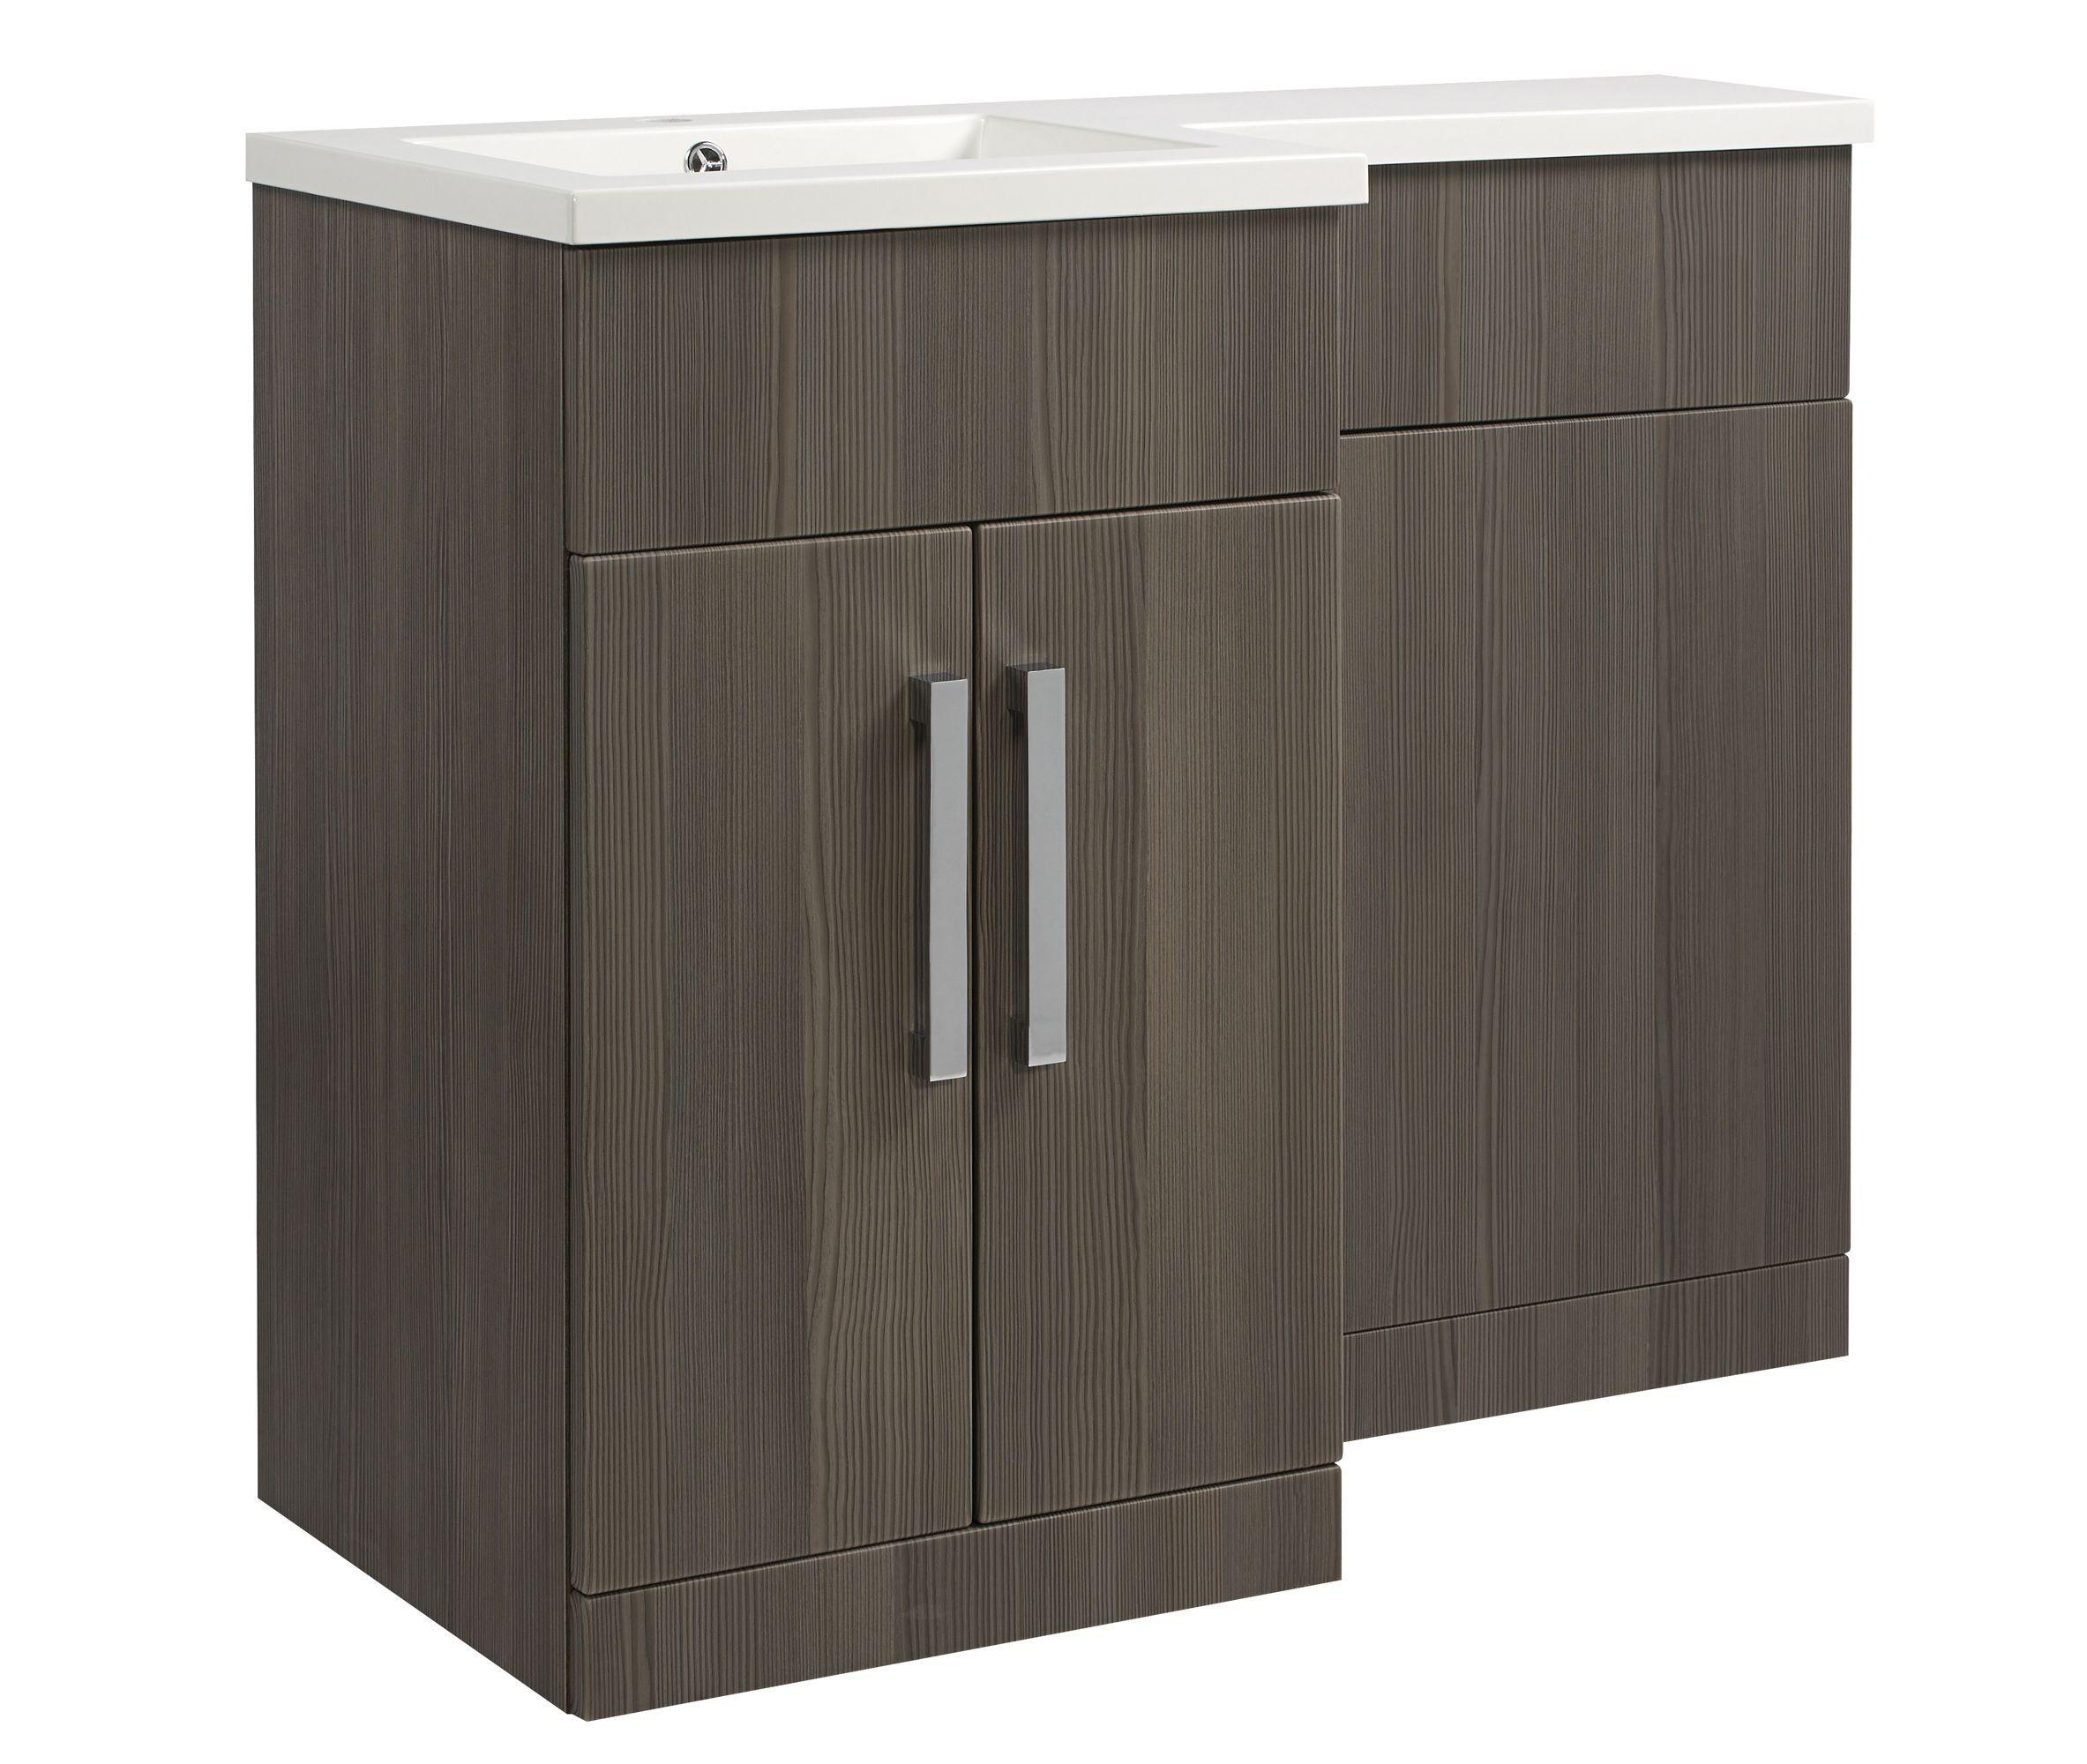 Cooke Lewis Ardesio Woodgrain Effect Bodega Grey Vanity Toilet  # Muebles Cic Bodega